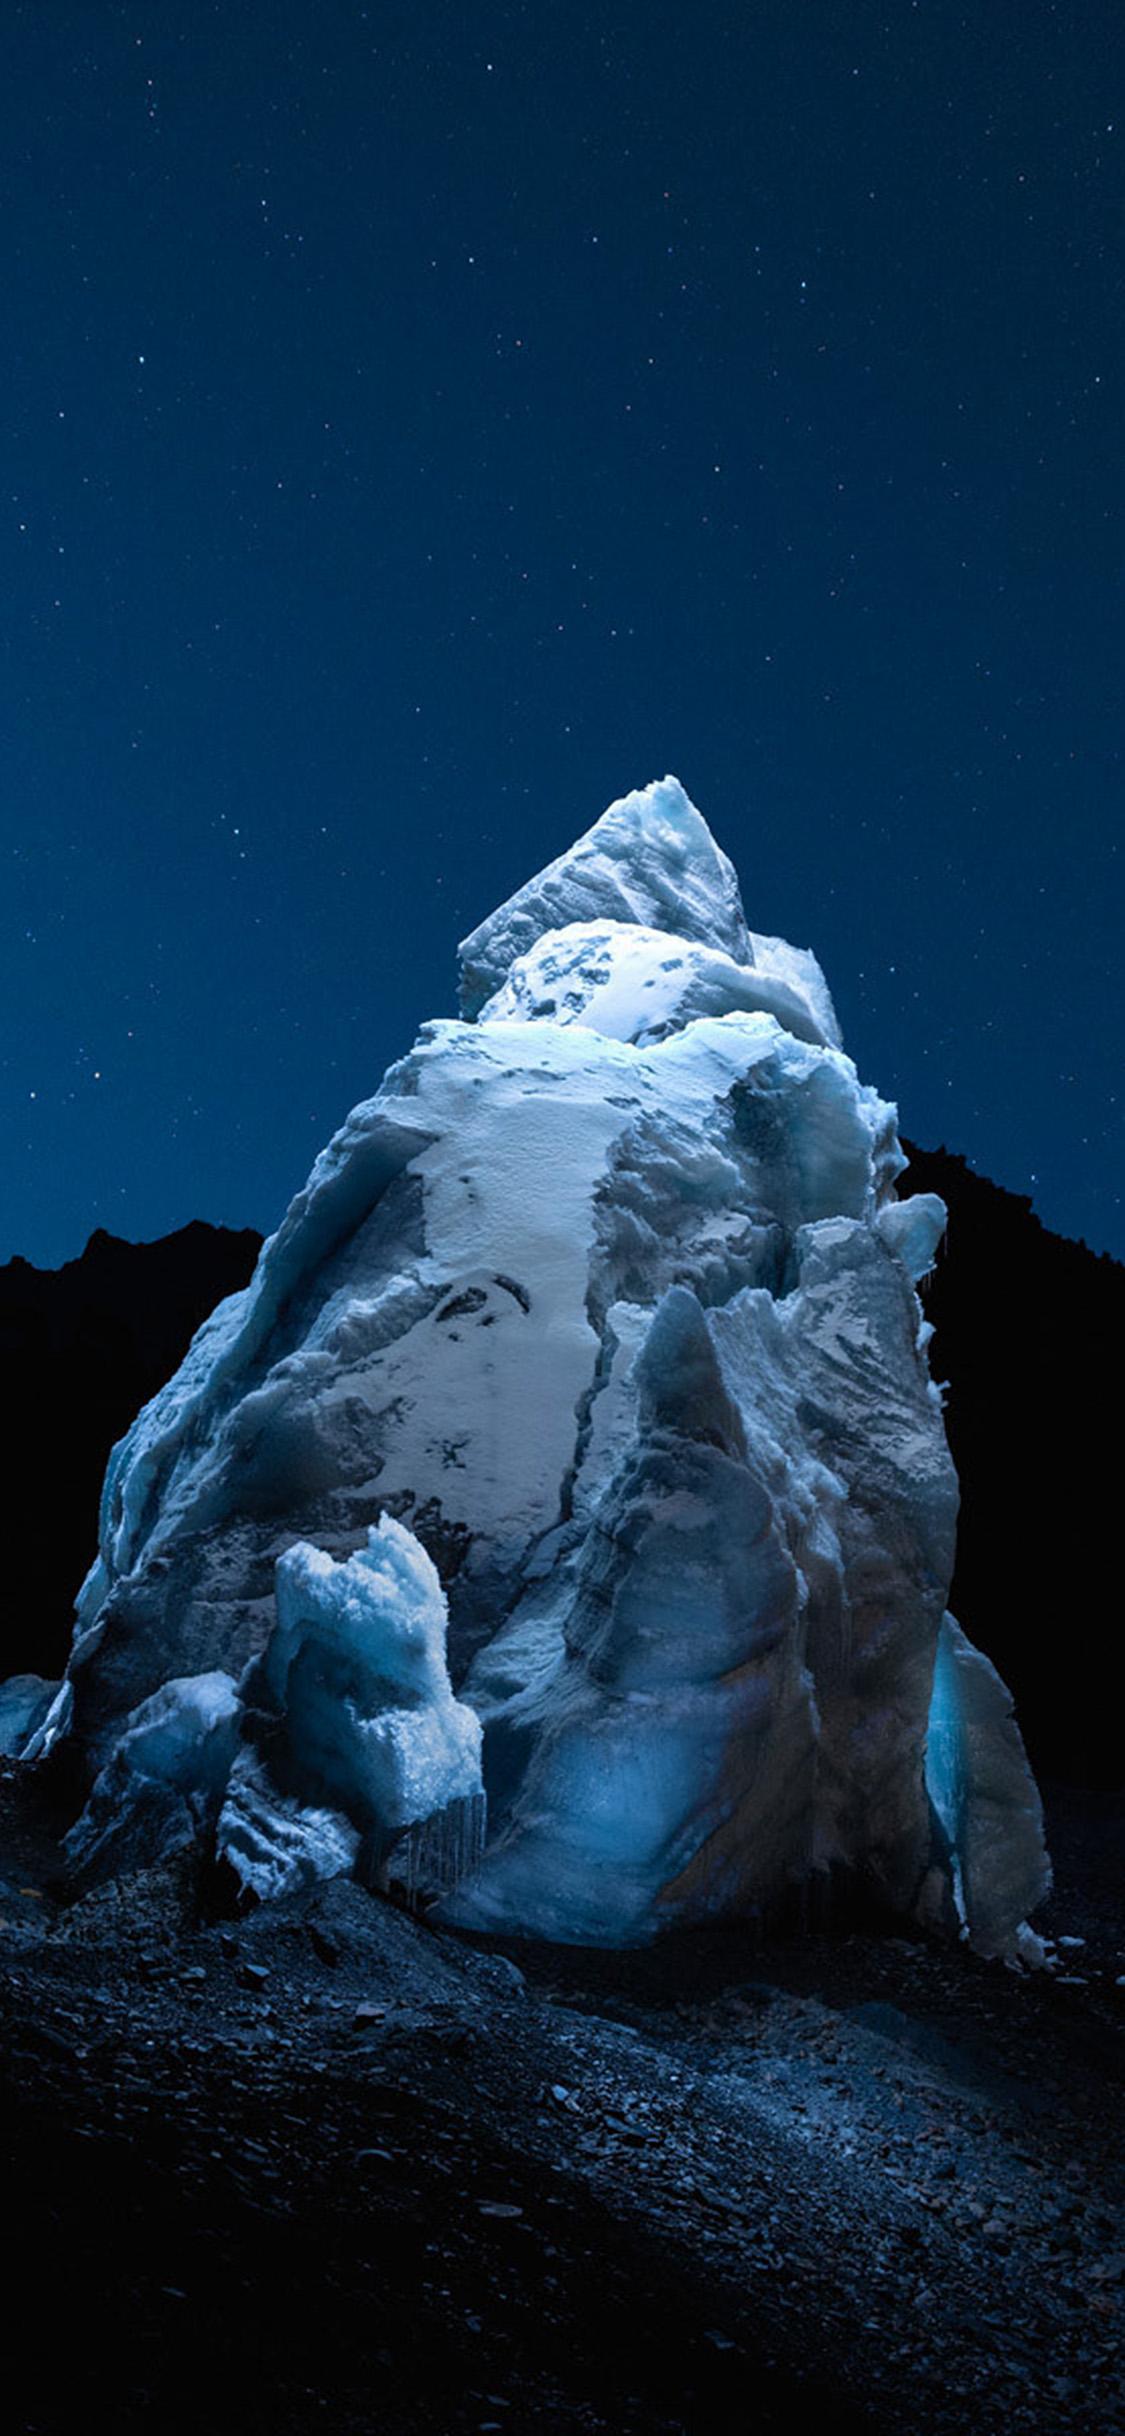 iPhonexpapers.com-Apple-iPhone-wallpaper-bh38-iceberg-dark-night-sky-art